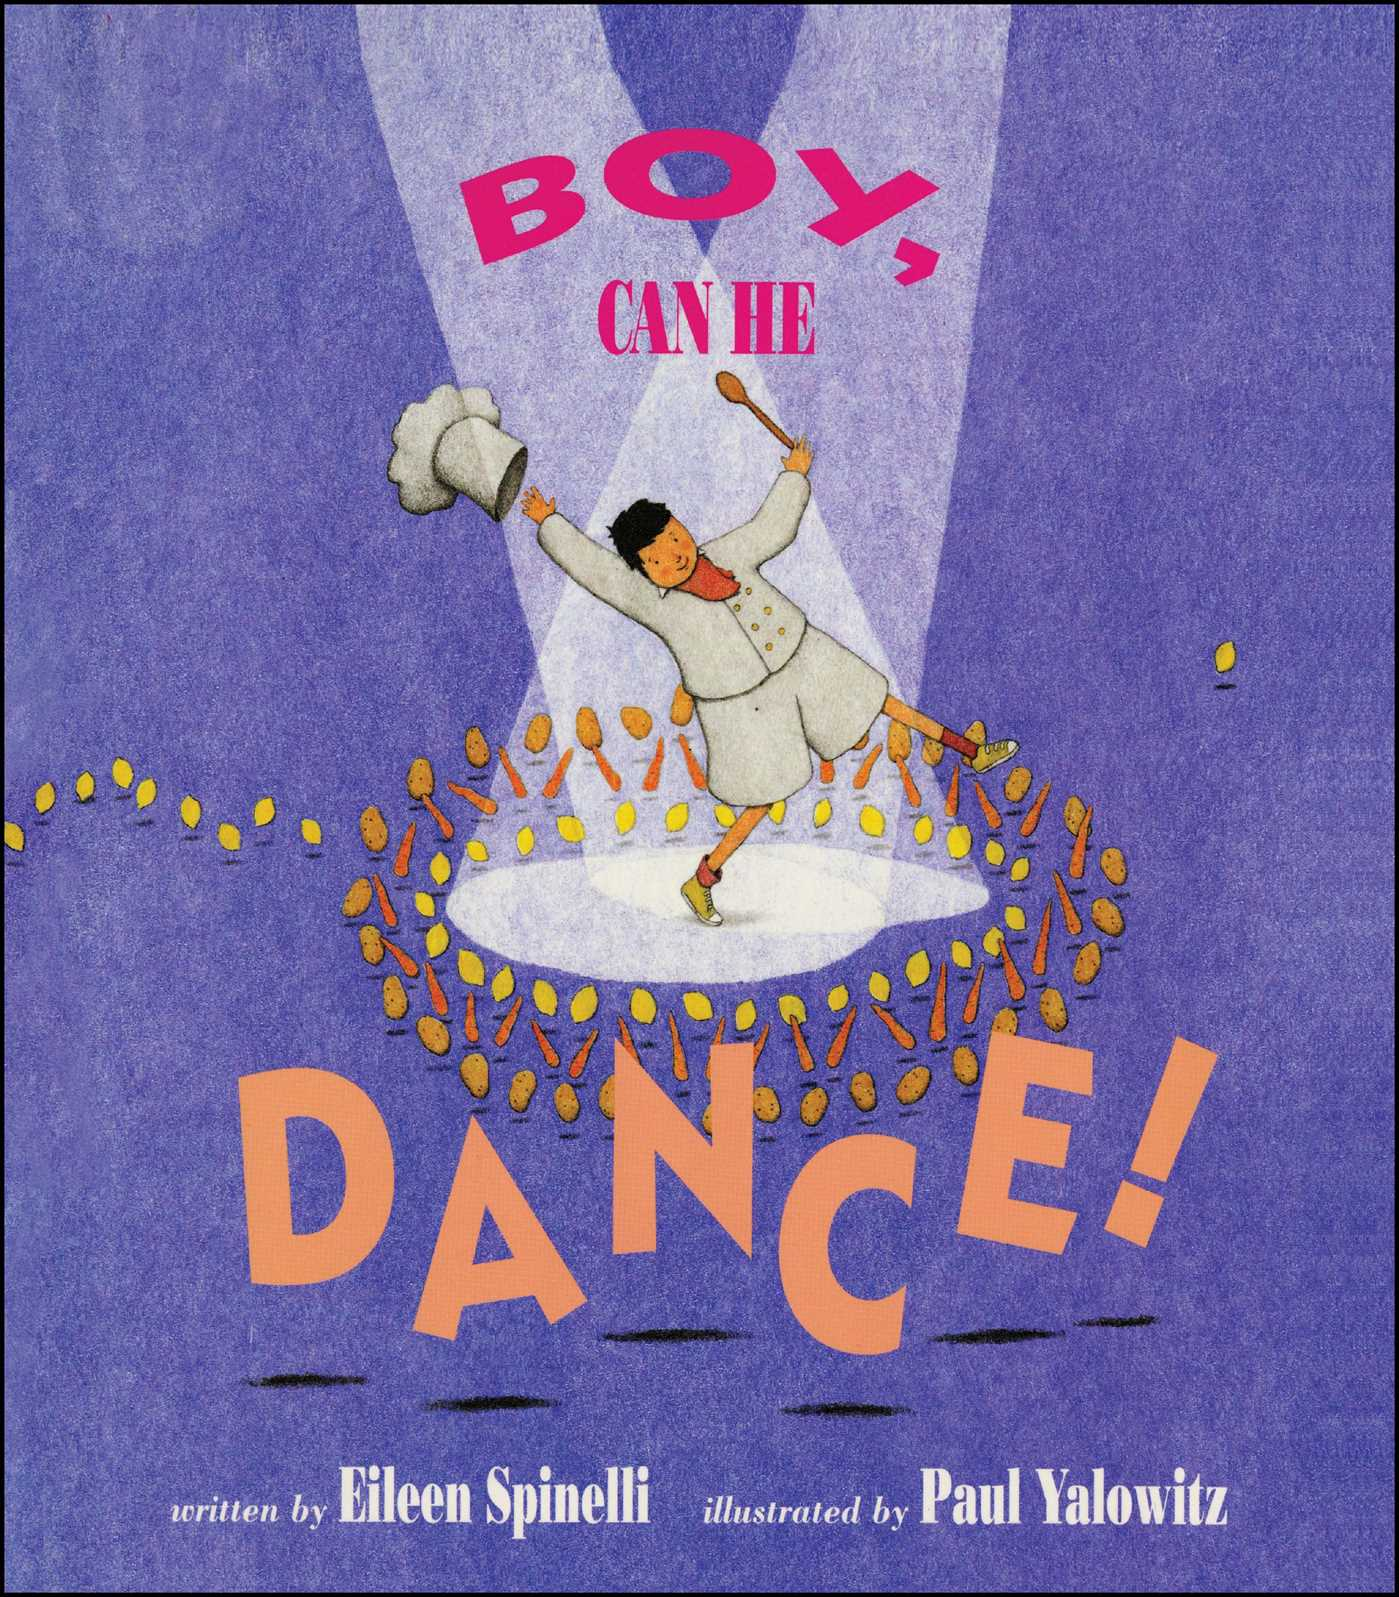 Boy can he dance 9781442474413 hr